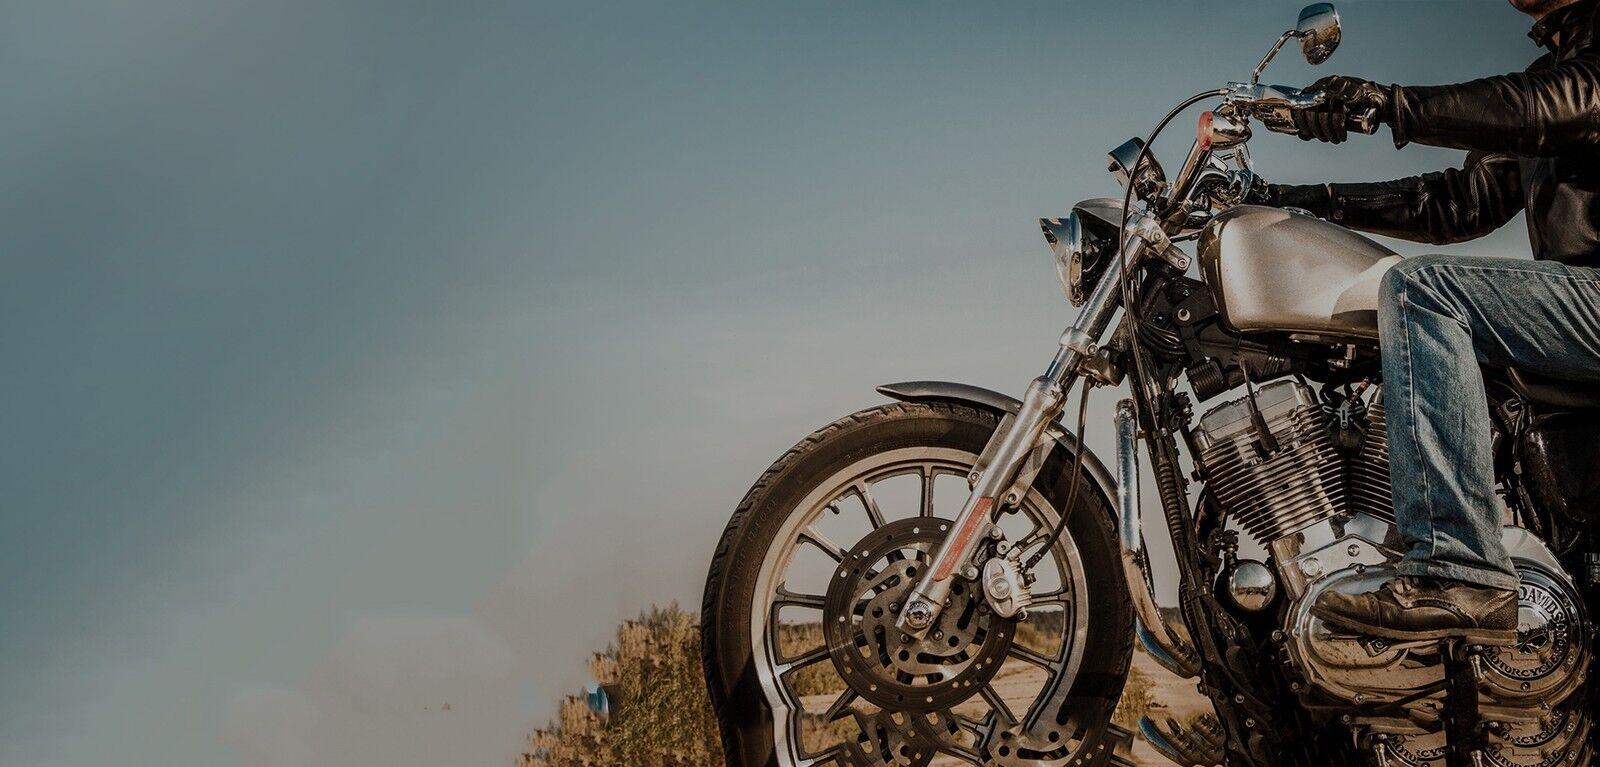 WILDRIDER MOTORCYCLE PARTS